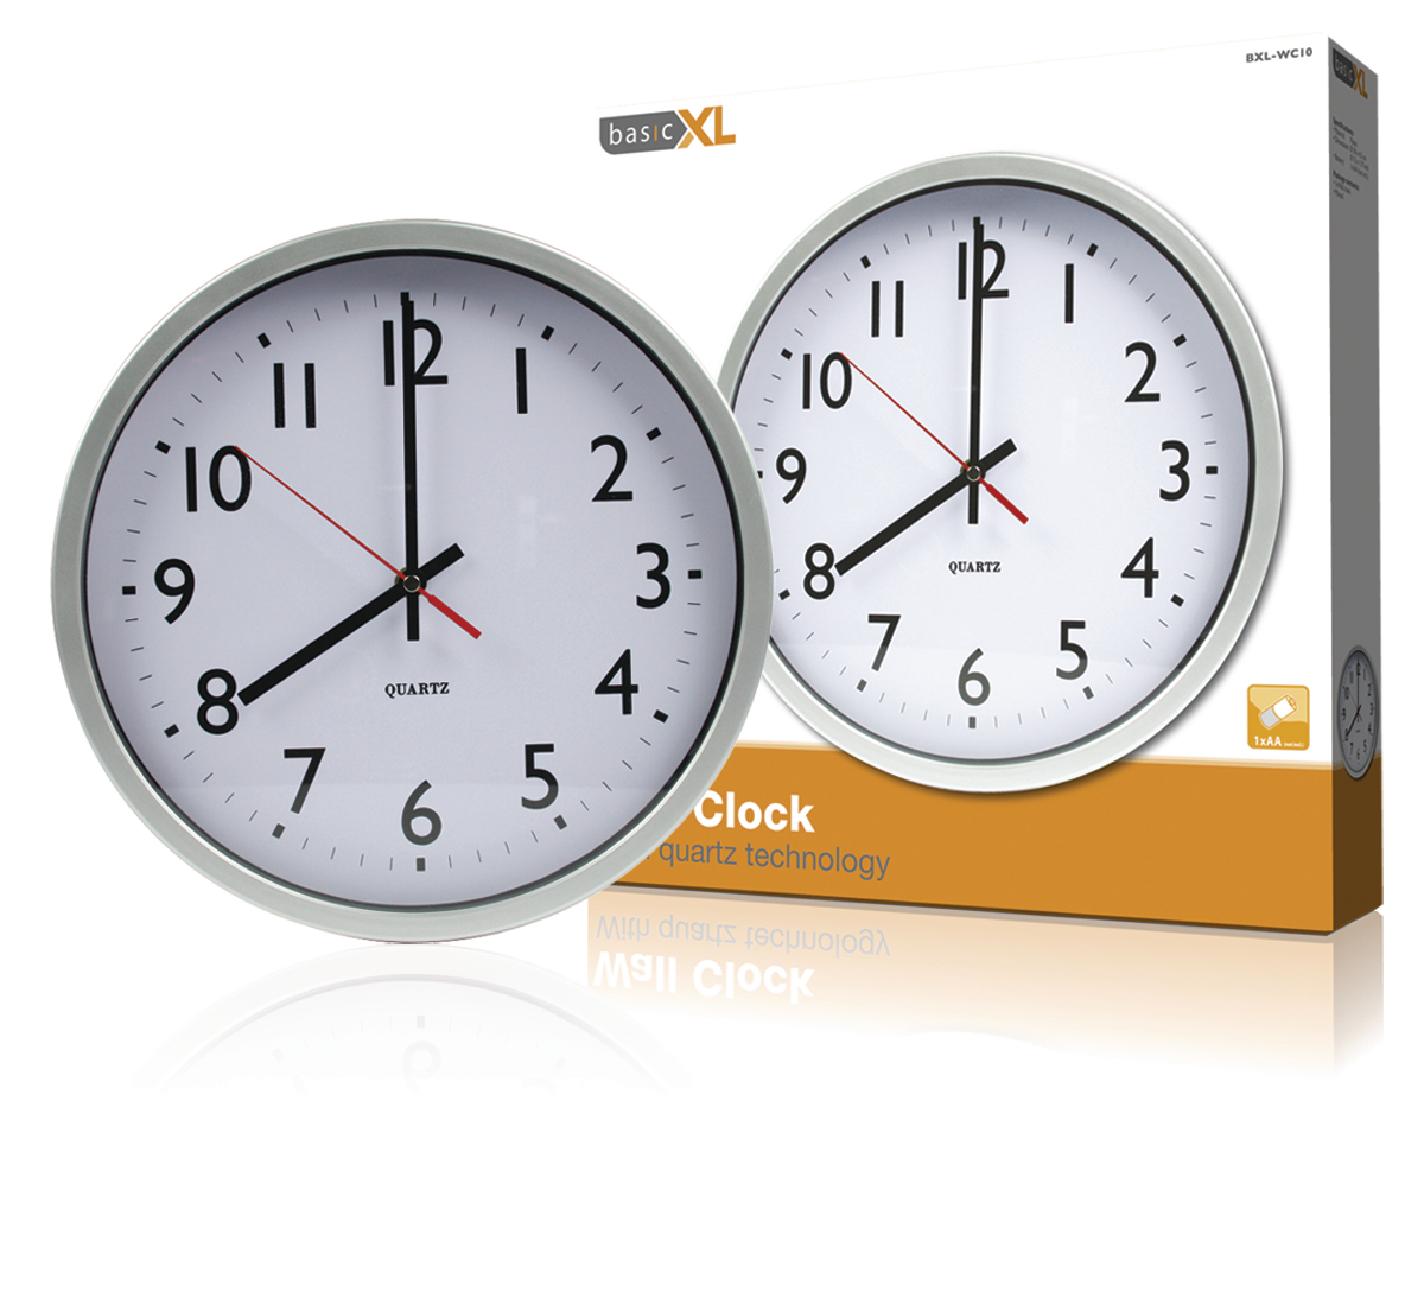 bxl wc10 basicxl horloge murale 30 cm analogiques blanc argent electronic. Black Bedroom Furniture Sets. Home Design Ideas